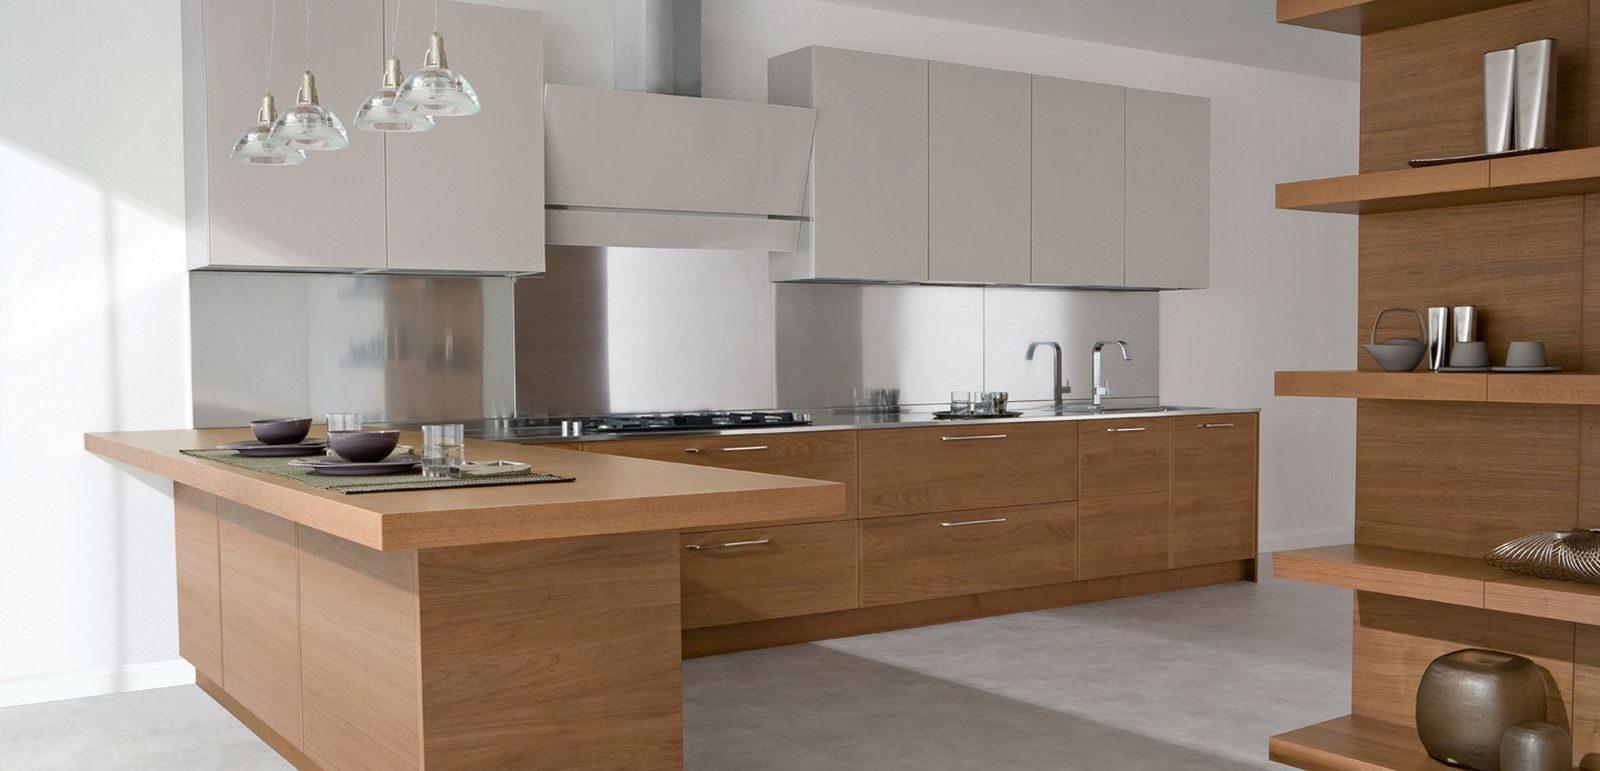 Muebles modernos im genes taringa - Muebles de cocina modernos ...